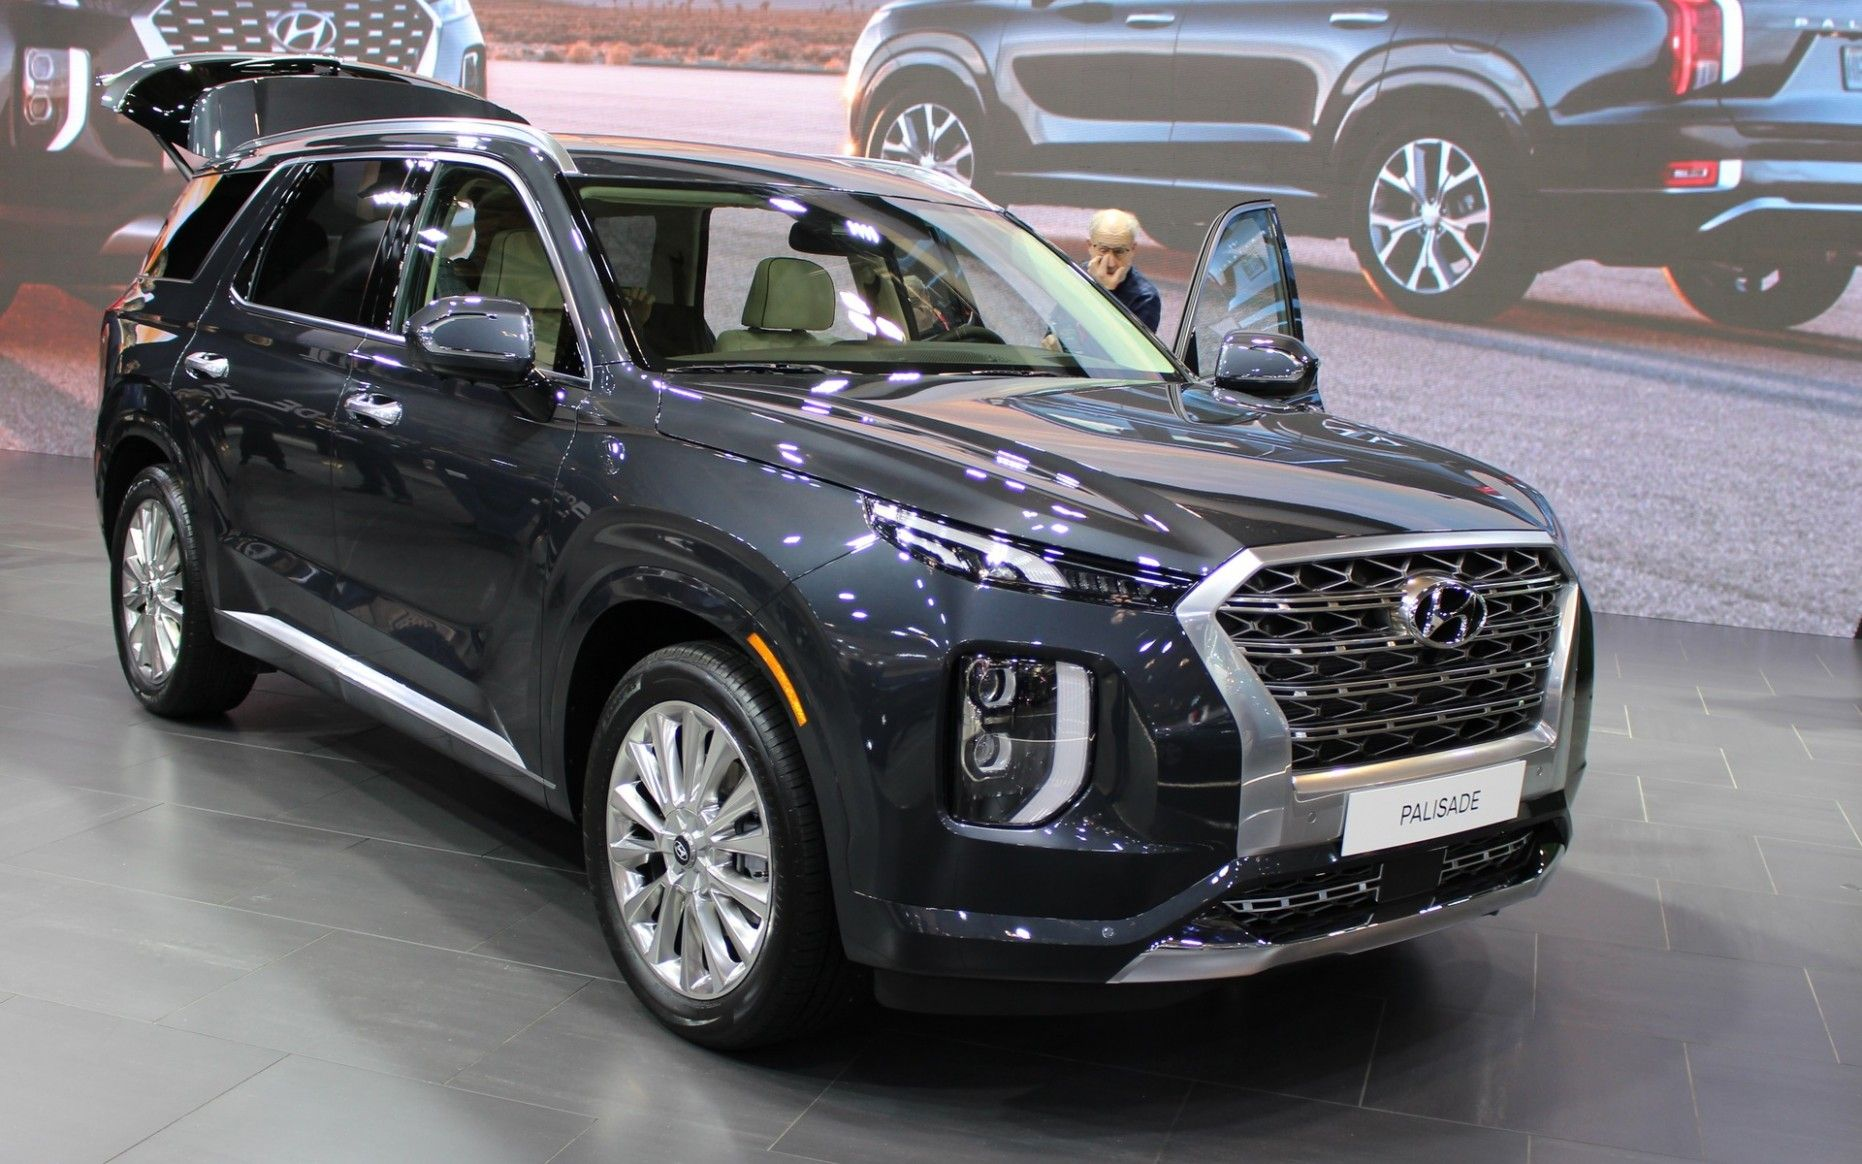 How Will 2020 Hyundai Palisade Price Design Be In The Hyundai Canada Hyundai Performance Cars